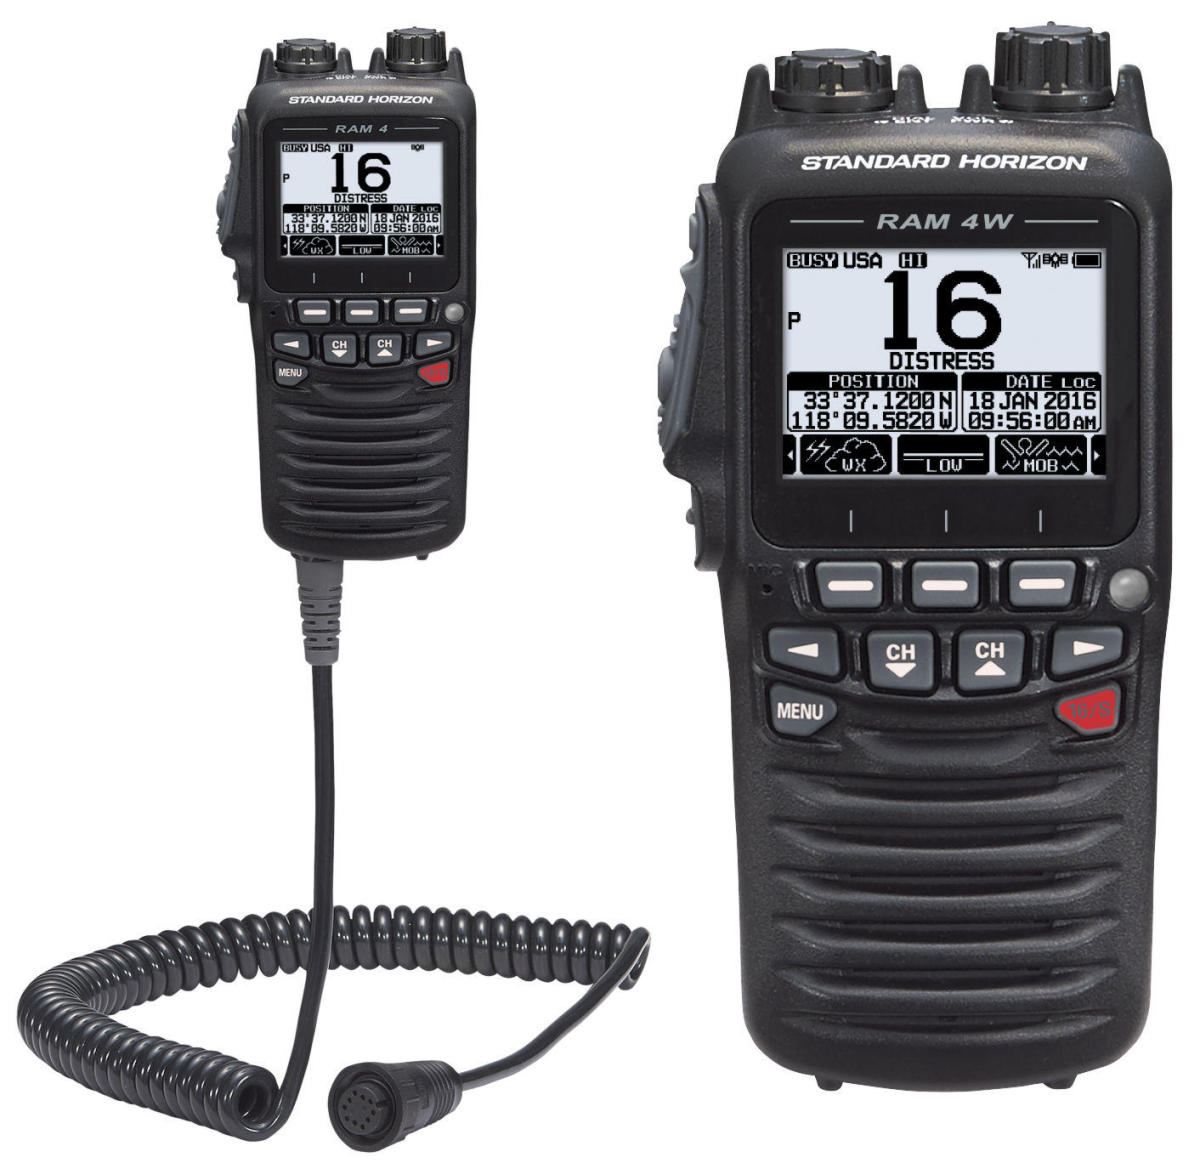 SH_RAM4_n_RAM4W_wireless_mics_for_GX6000-6500_radios_aPanbo